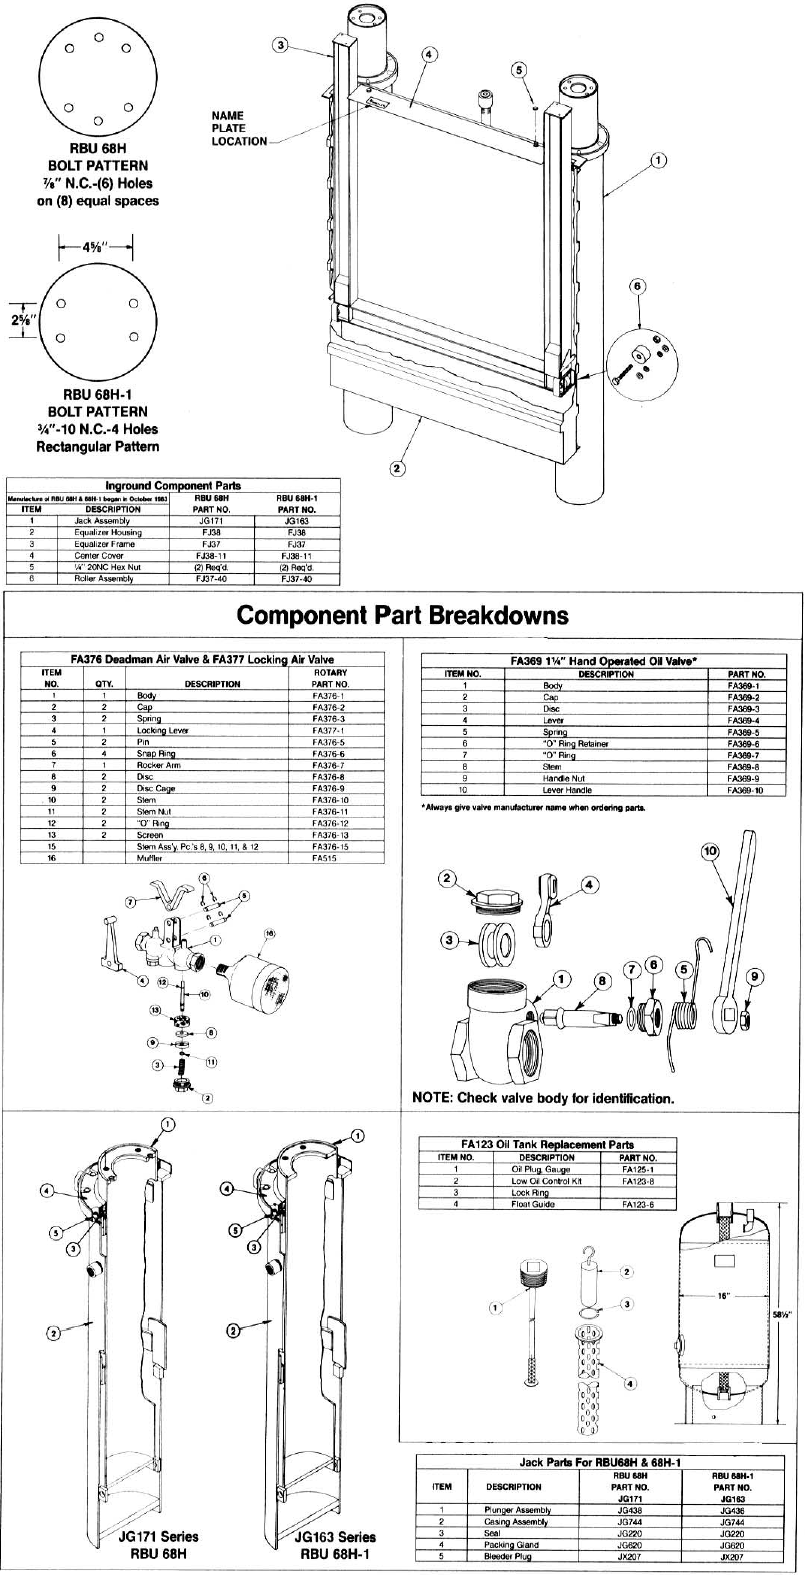 30 Rotary Lift Parts Diagram